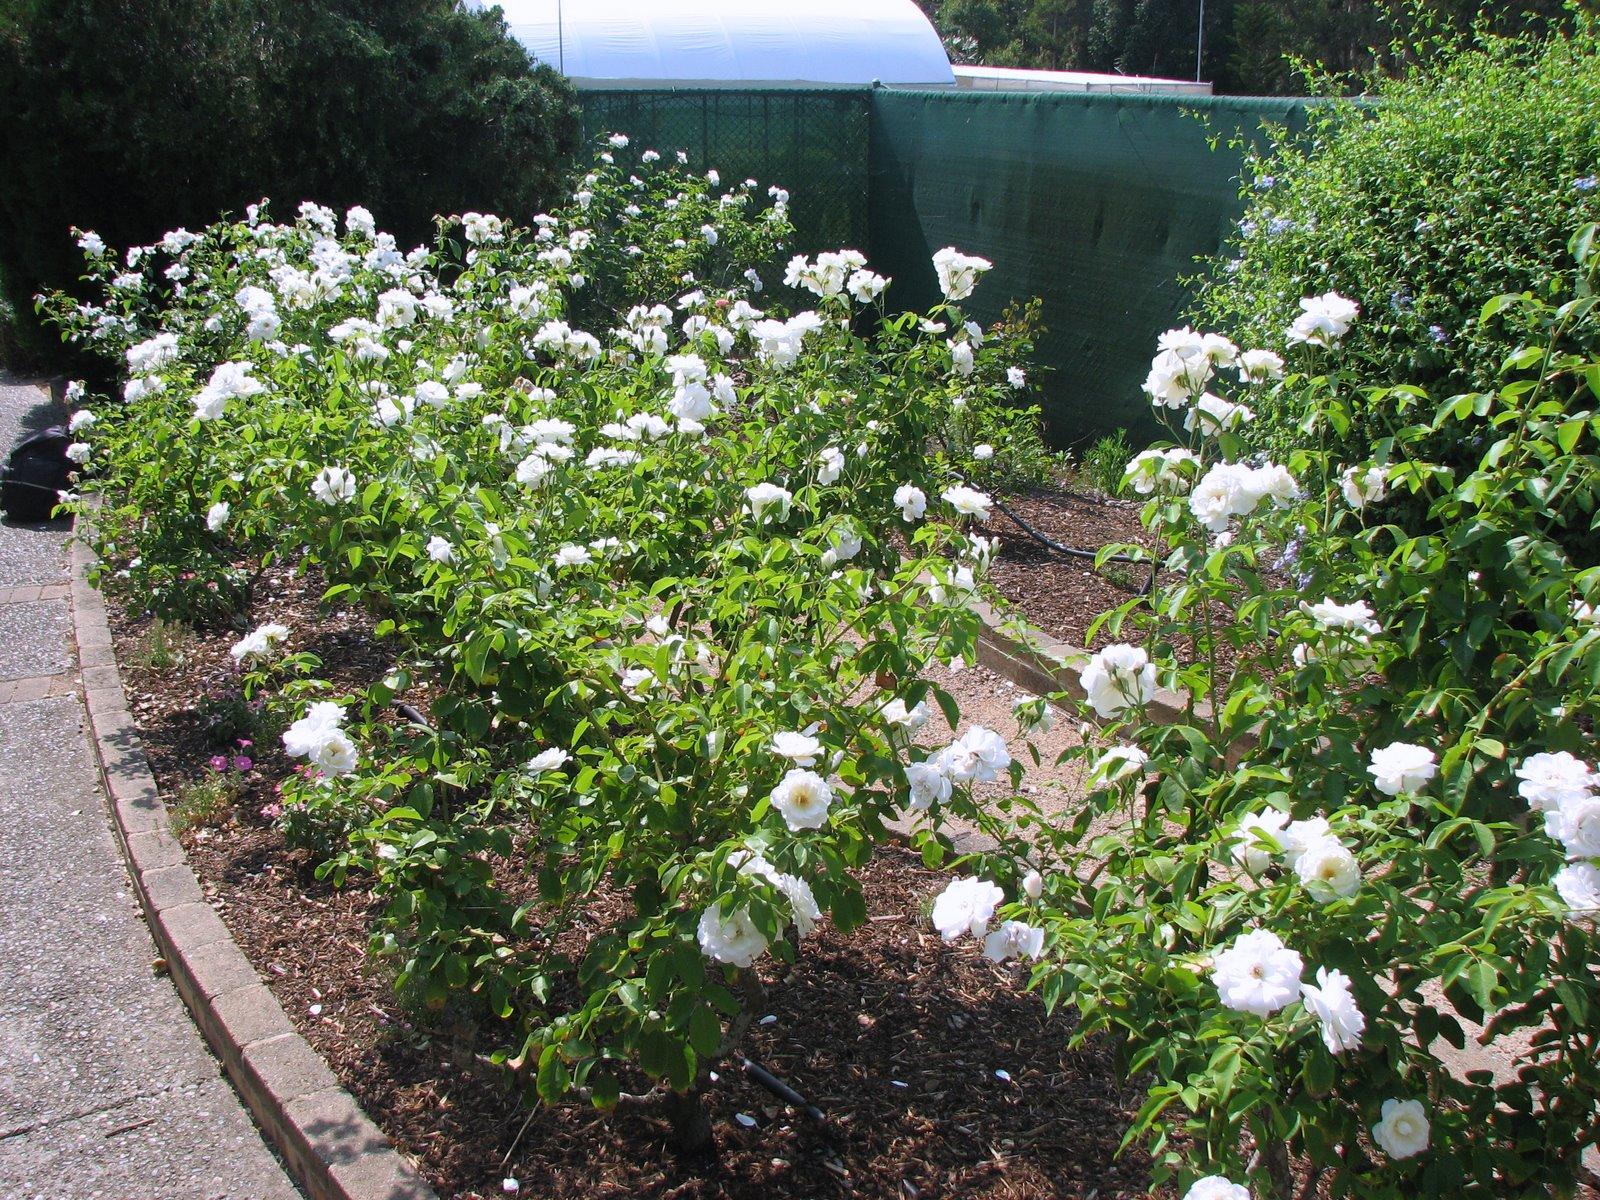 Plant Photography: White Rose Garden